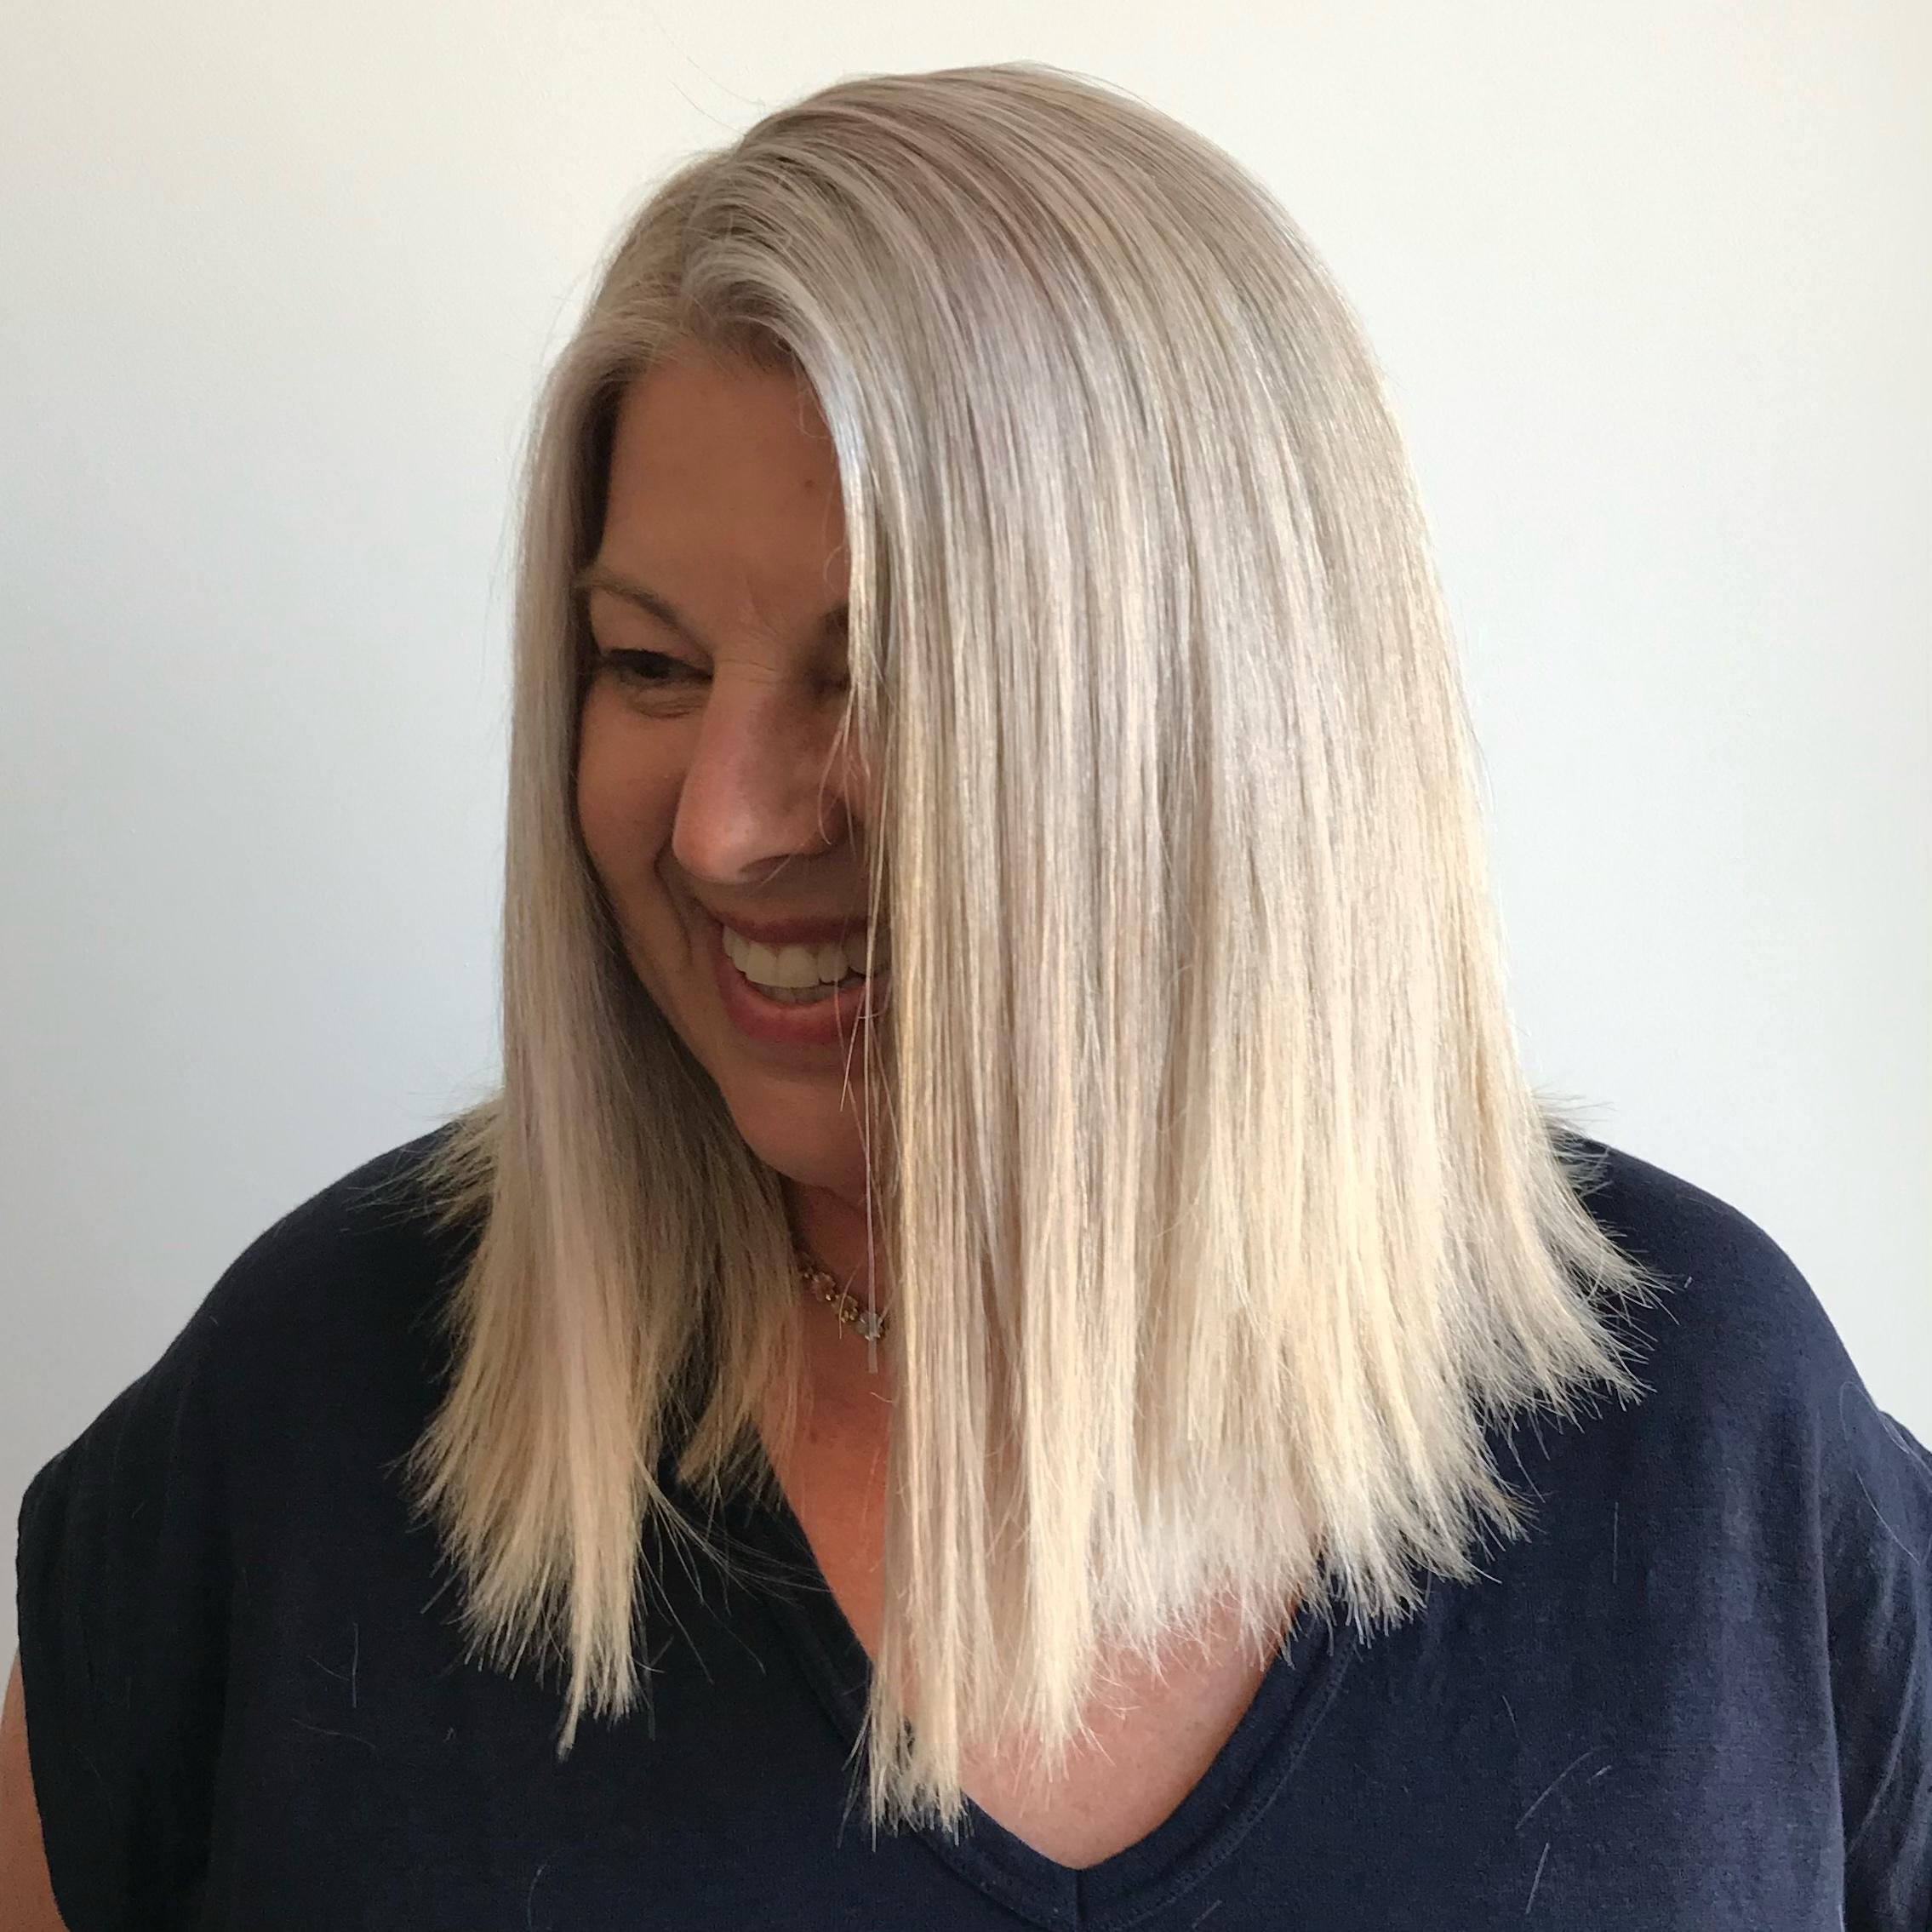 Hair cutting | Trigg Hair Studio | Hairdresser Trigg Scarborough North Beach Watermans Karinyup Duncraig Carine Sorrento